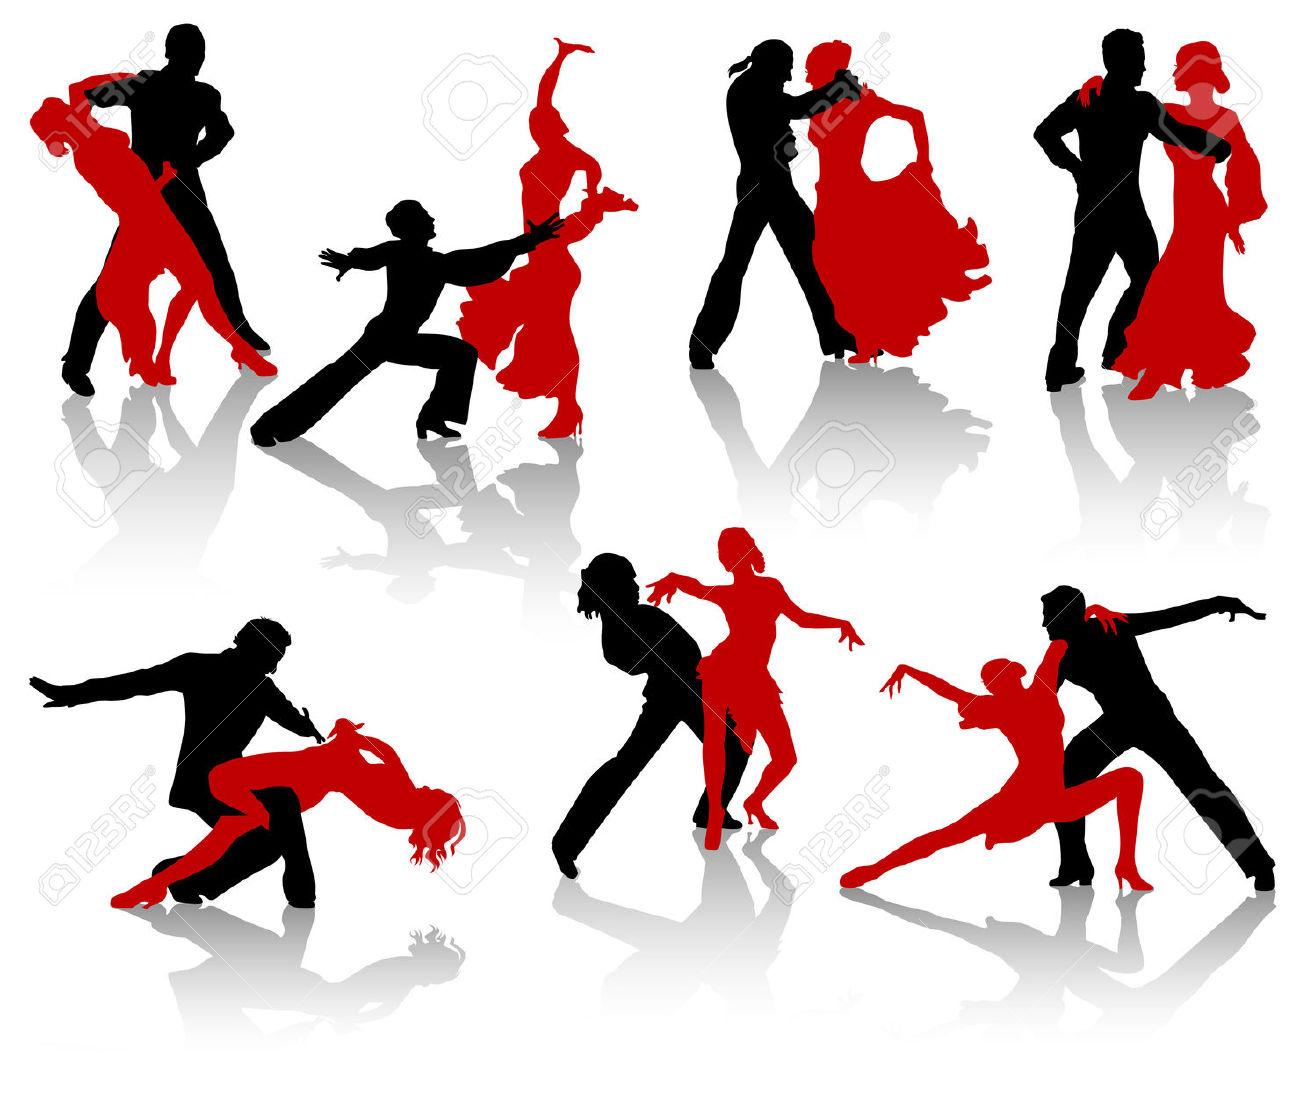 Silhouettes Of The Pairs Dancing Ballroom Dances. A Waltz, A.